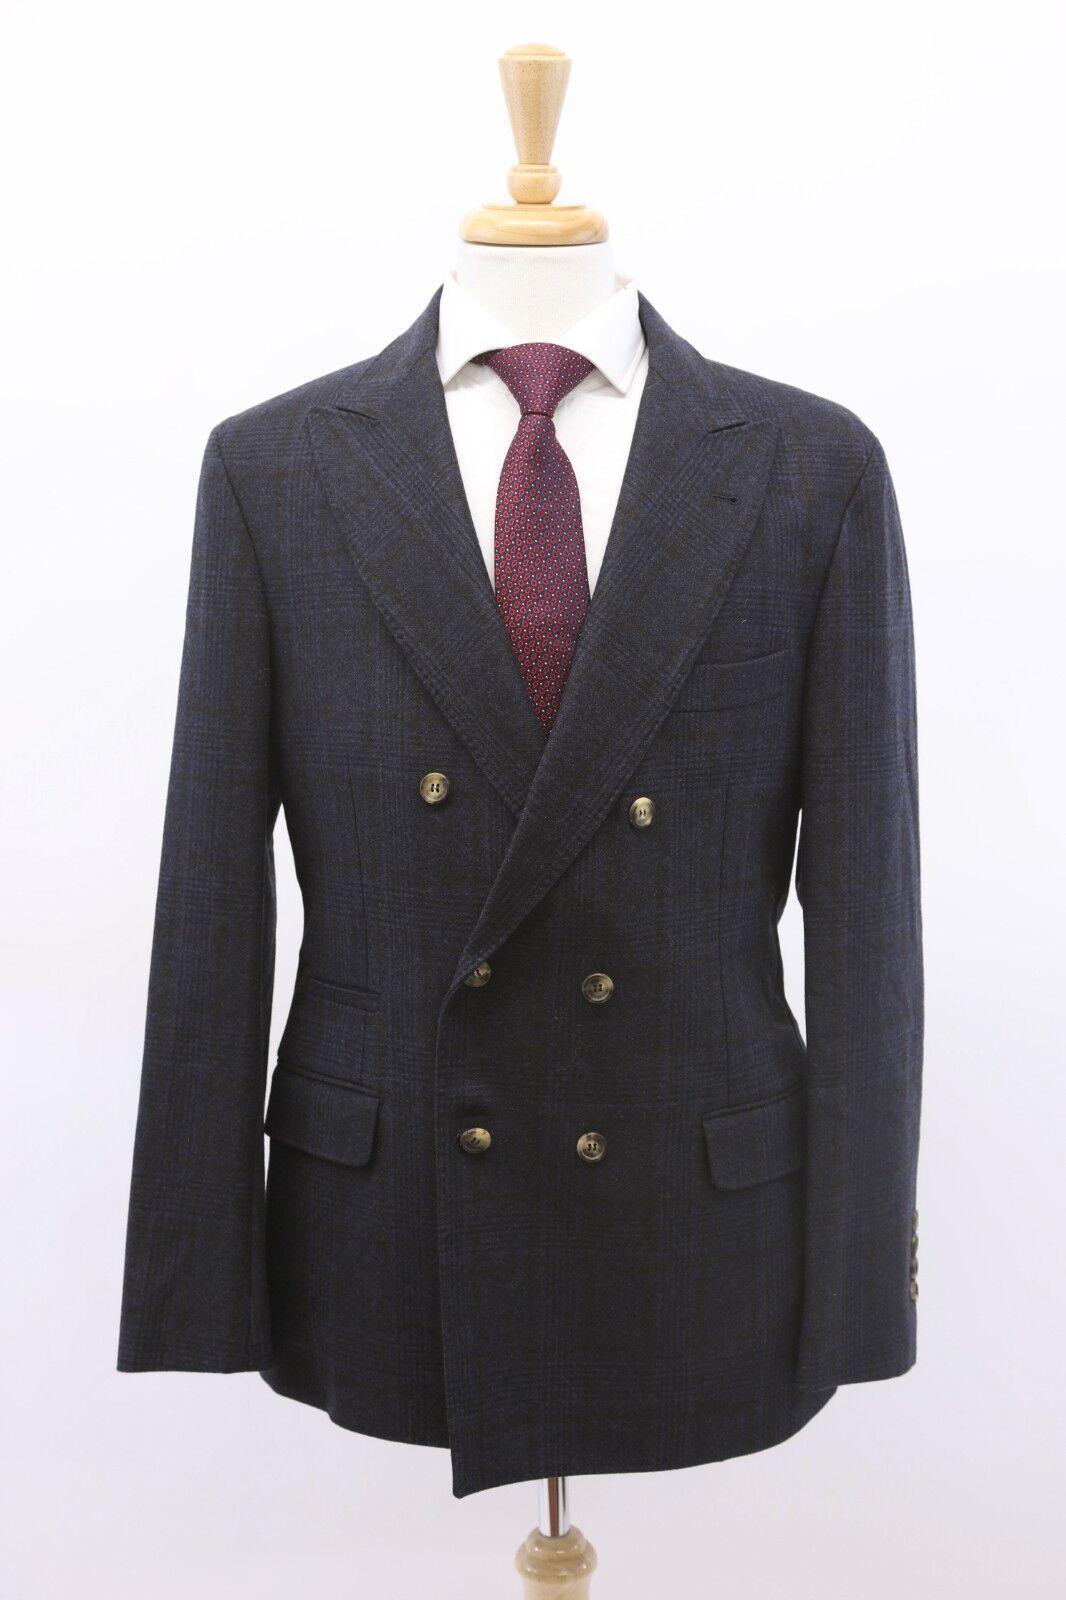 NWT Brunello Cucinelli Mens 100% Wool Plaid Print DB Sportcoat 50 40US A191